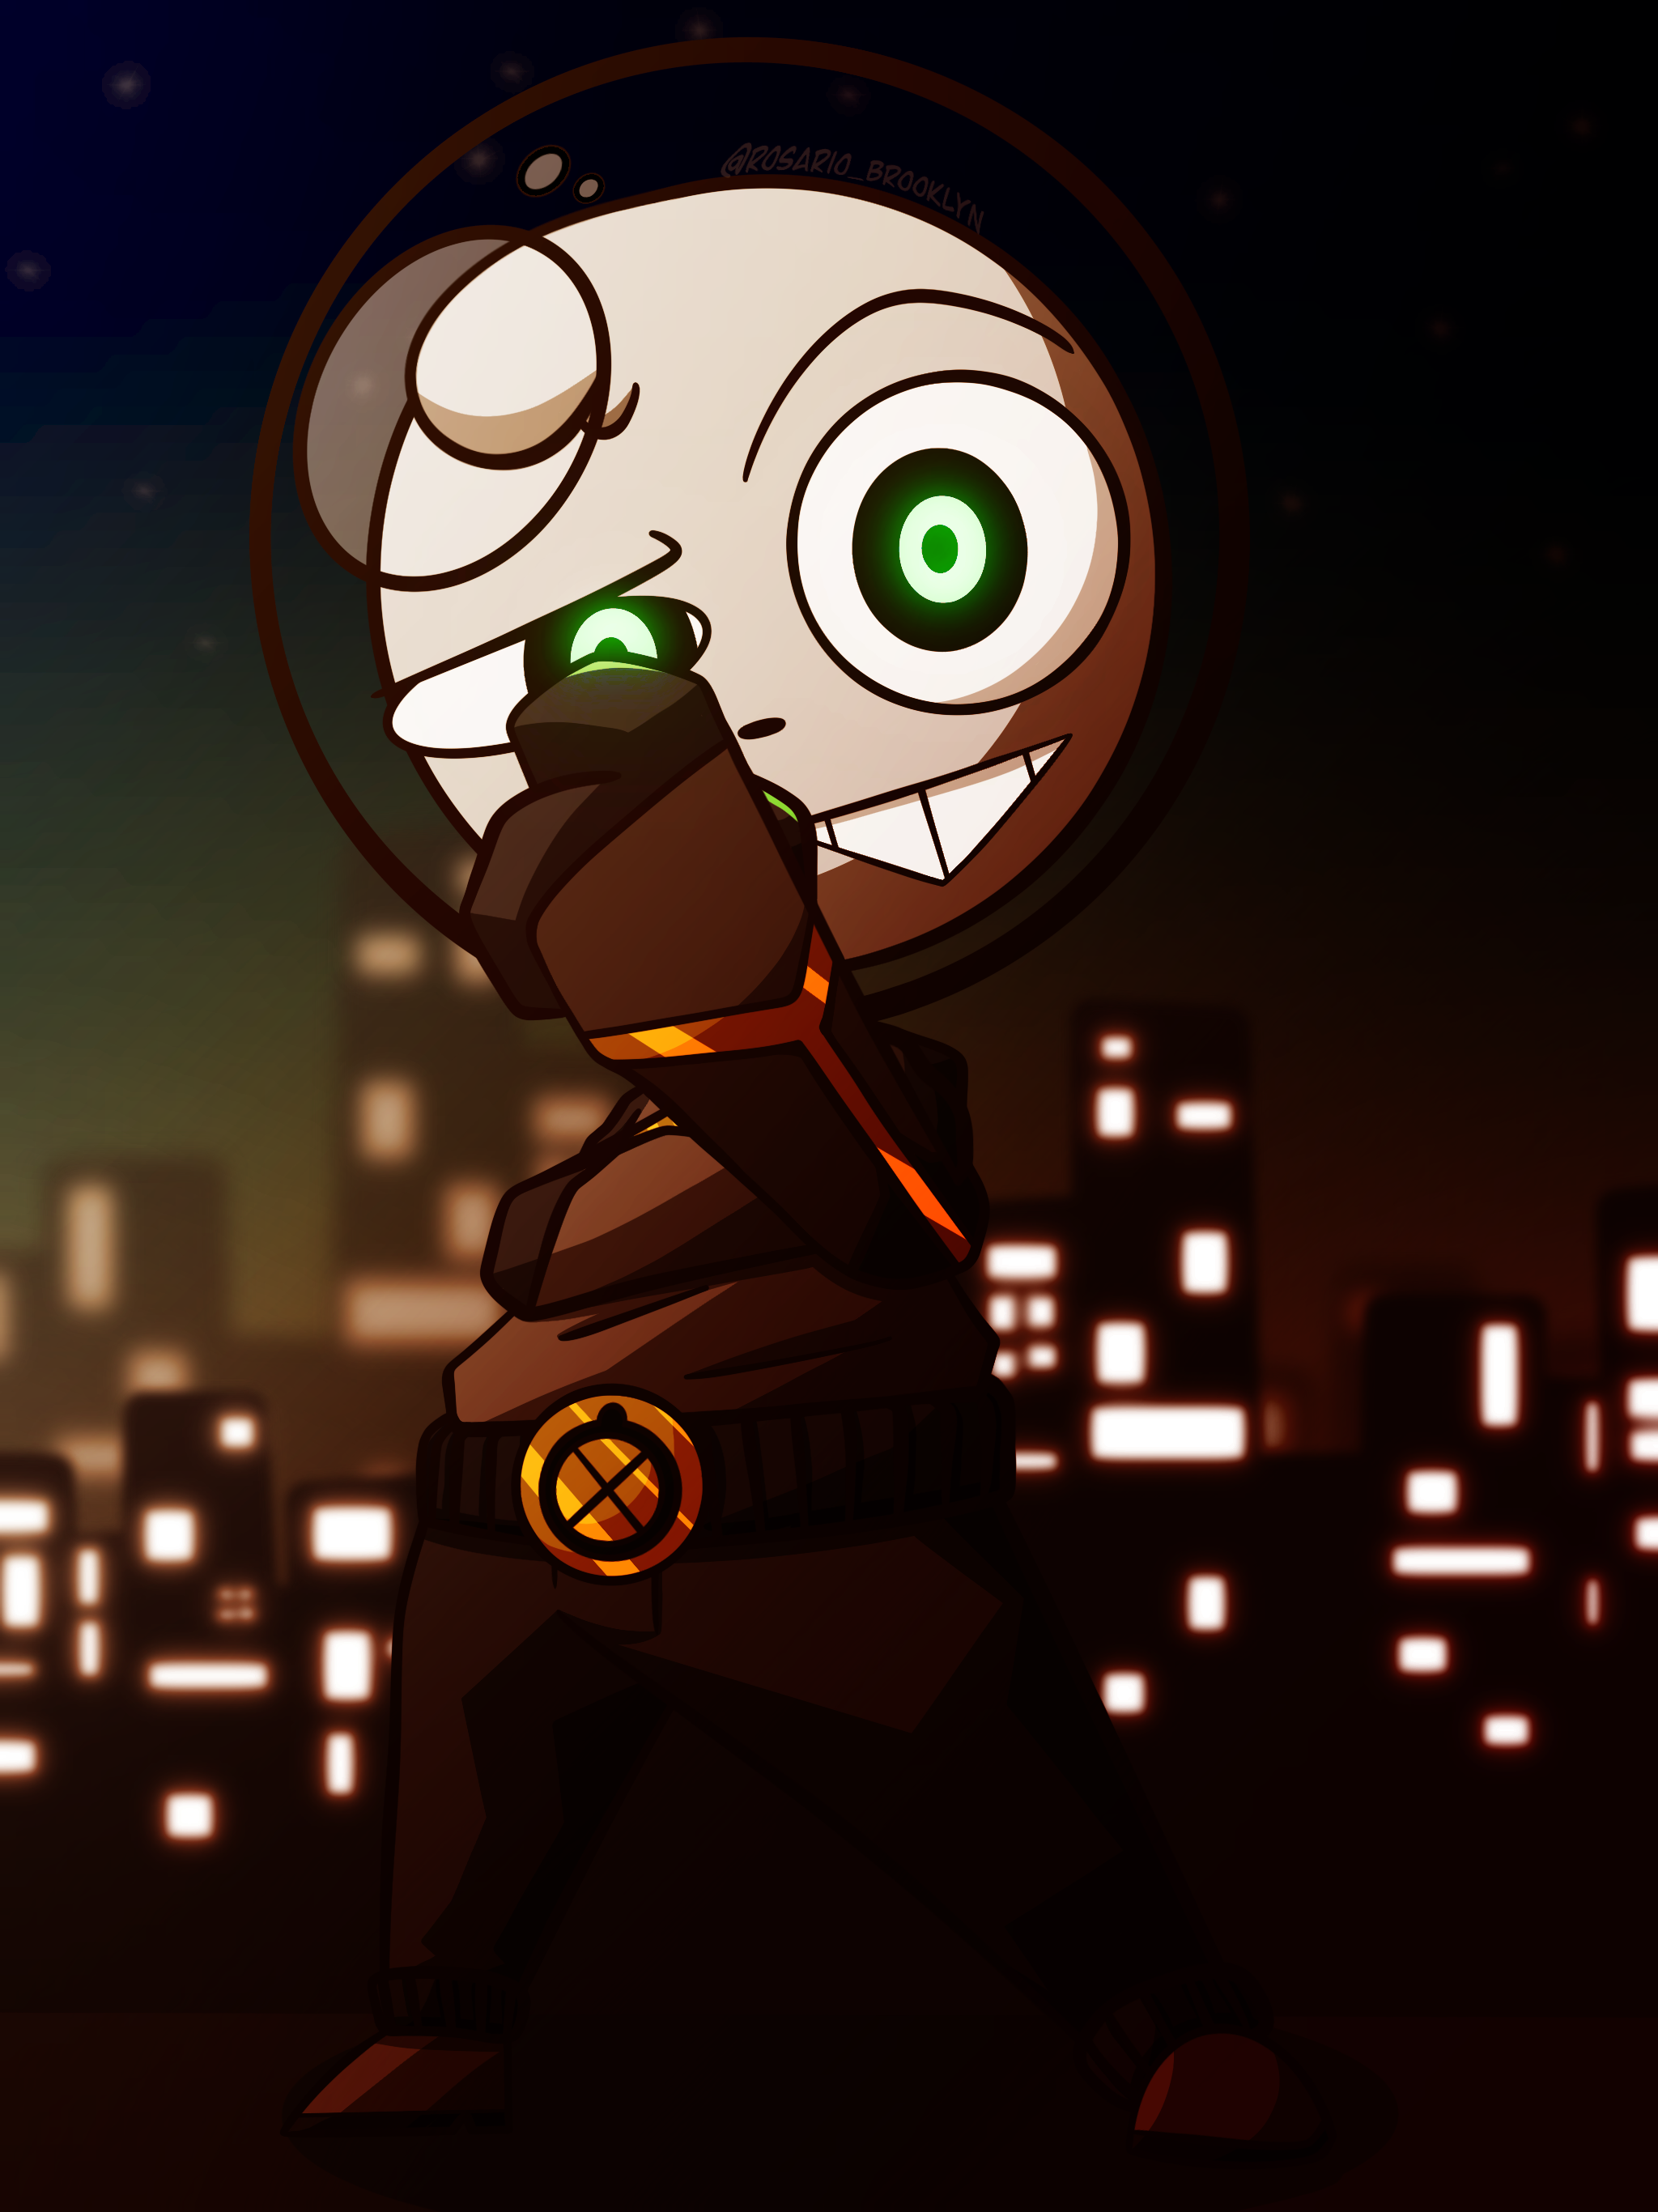 Spaceboi